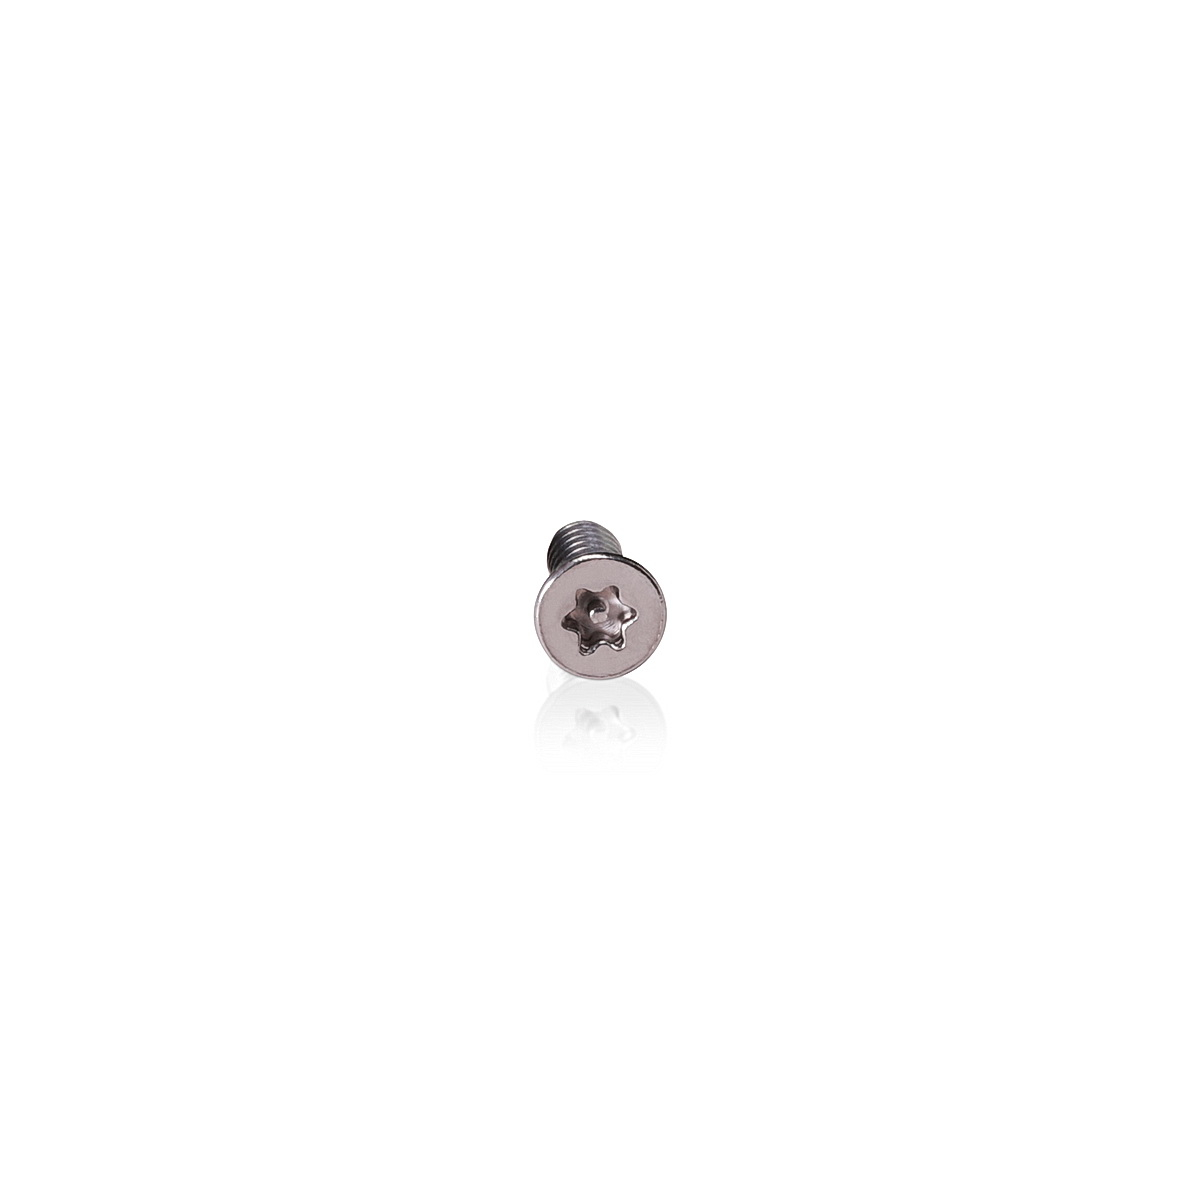 #10-24 x 1/2''   Torx   Flat Head   Machine Screws   Stainless Steel 18-8